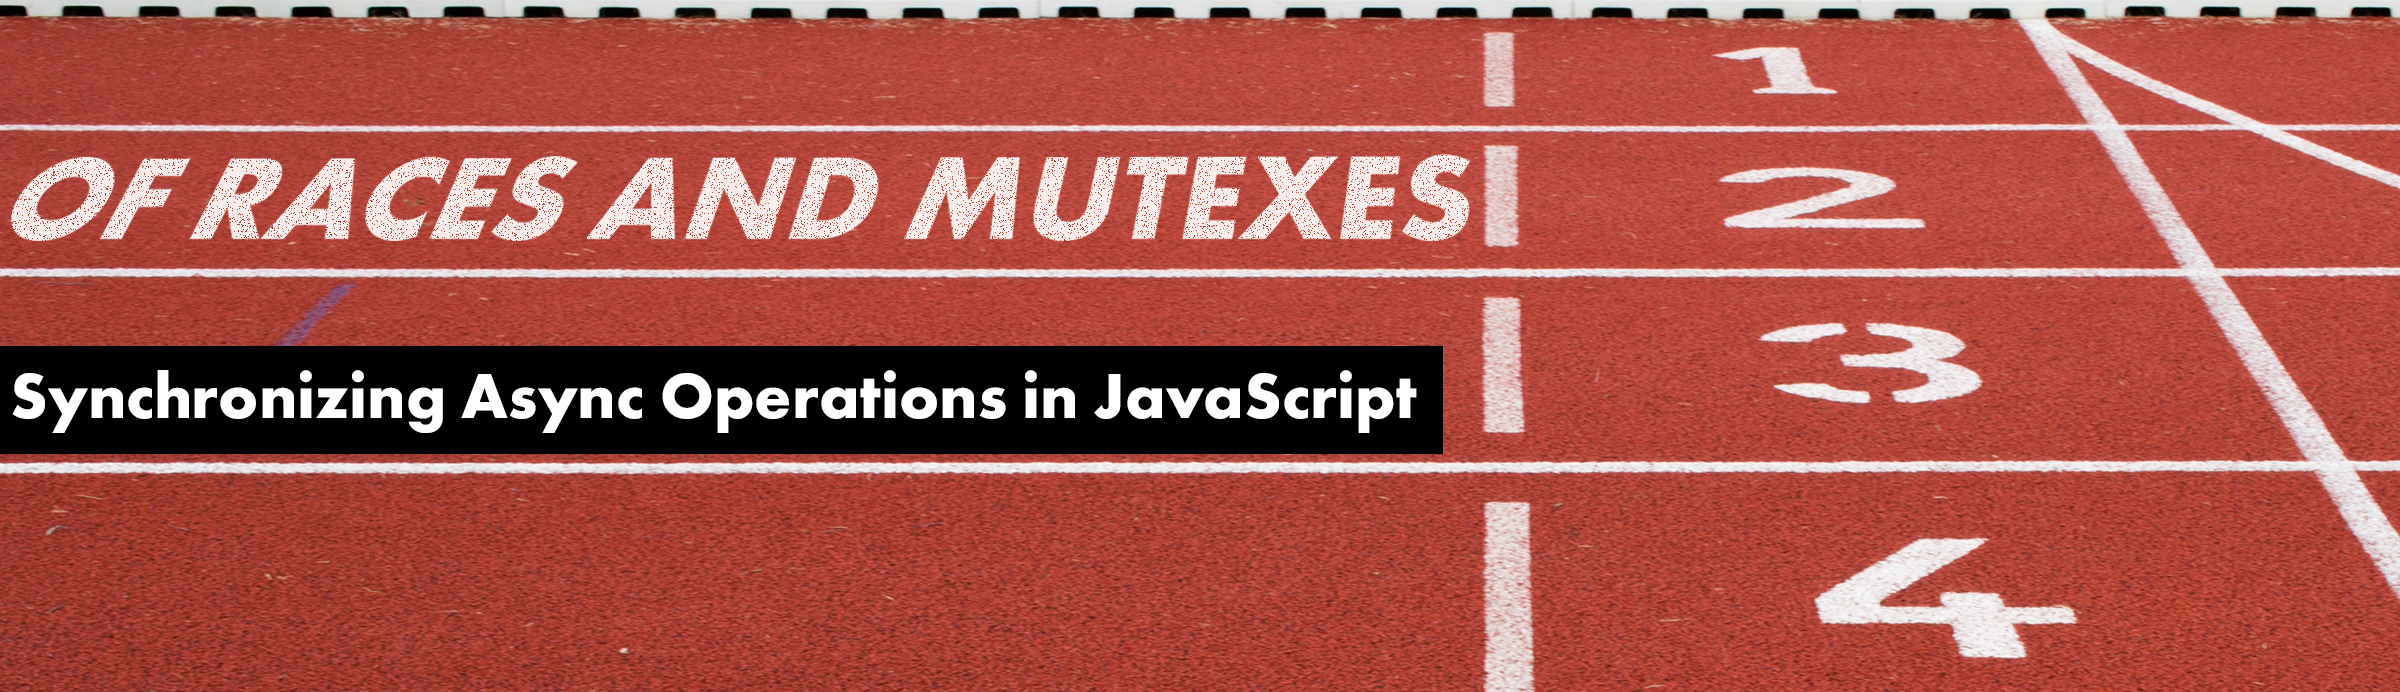 JavaScript Mutex: Synchronizing Async Operations